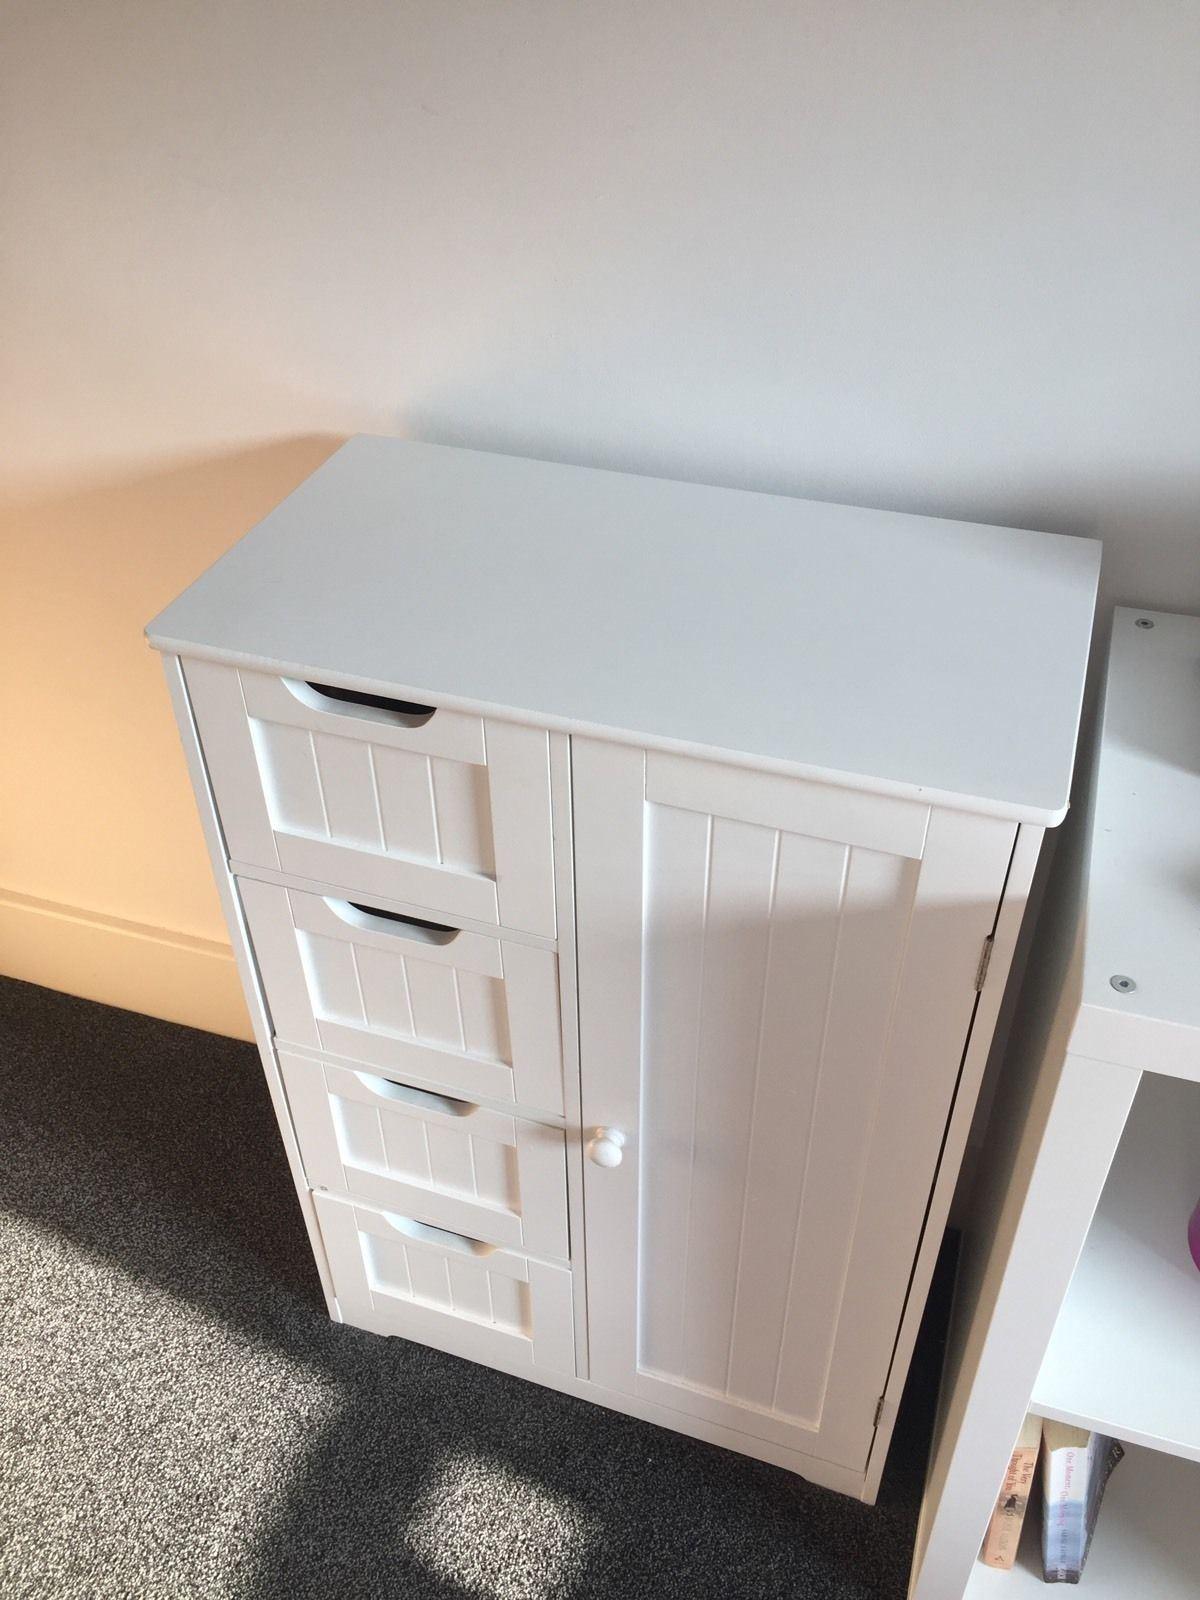 New-White-Wooden-Bathroom-Cabinet-Shelf-Furniture-Cupboard-Bedroom-Storage-Unit miniatuur 24